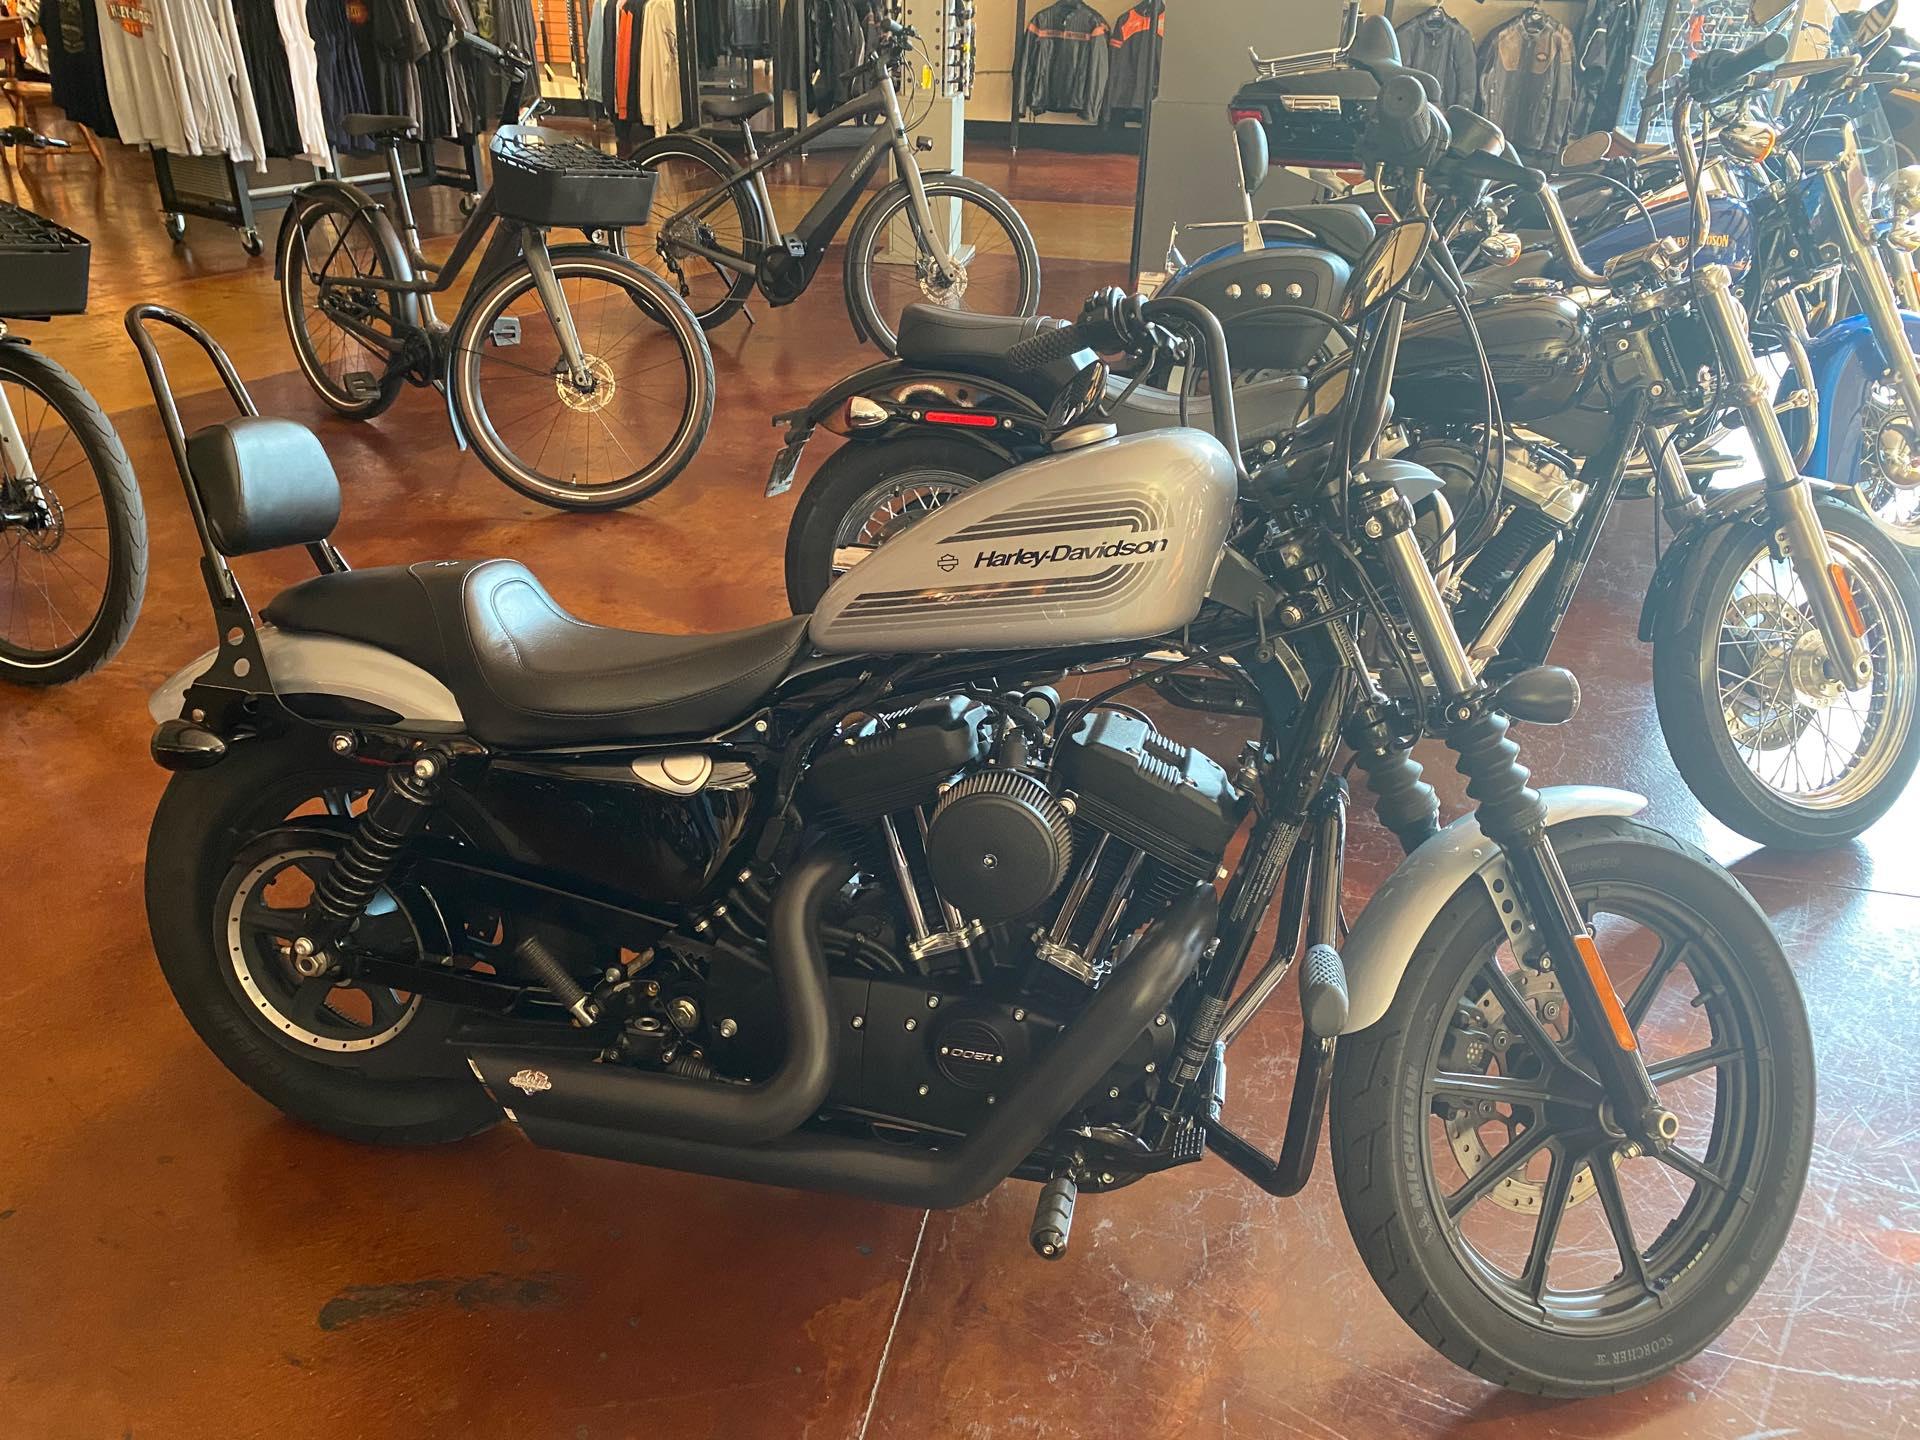 2020 Harley-Davidson Sportster Iron 1200 at Gold Star Harley-Davidson